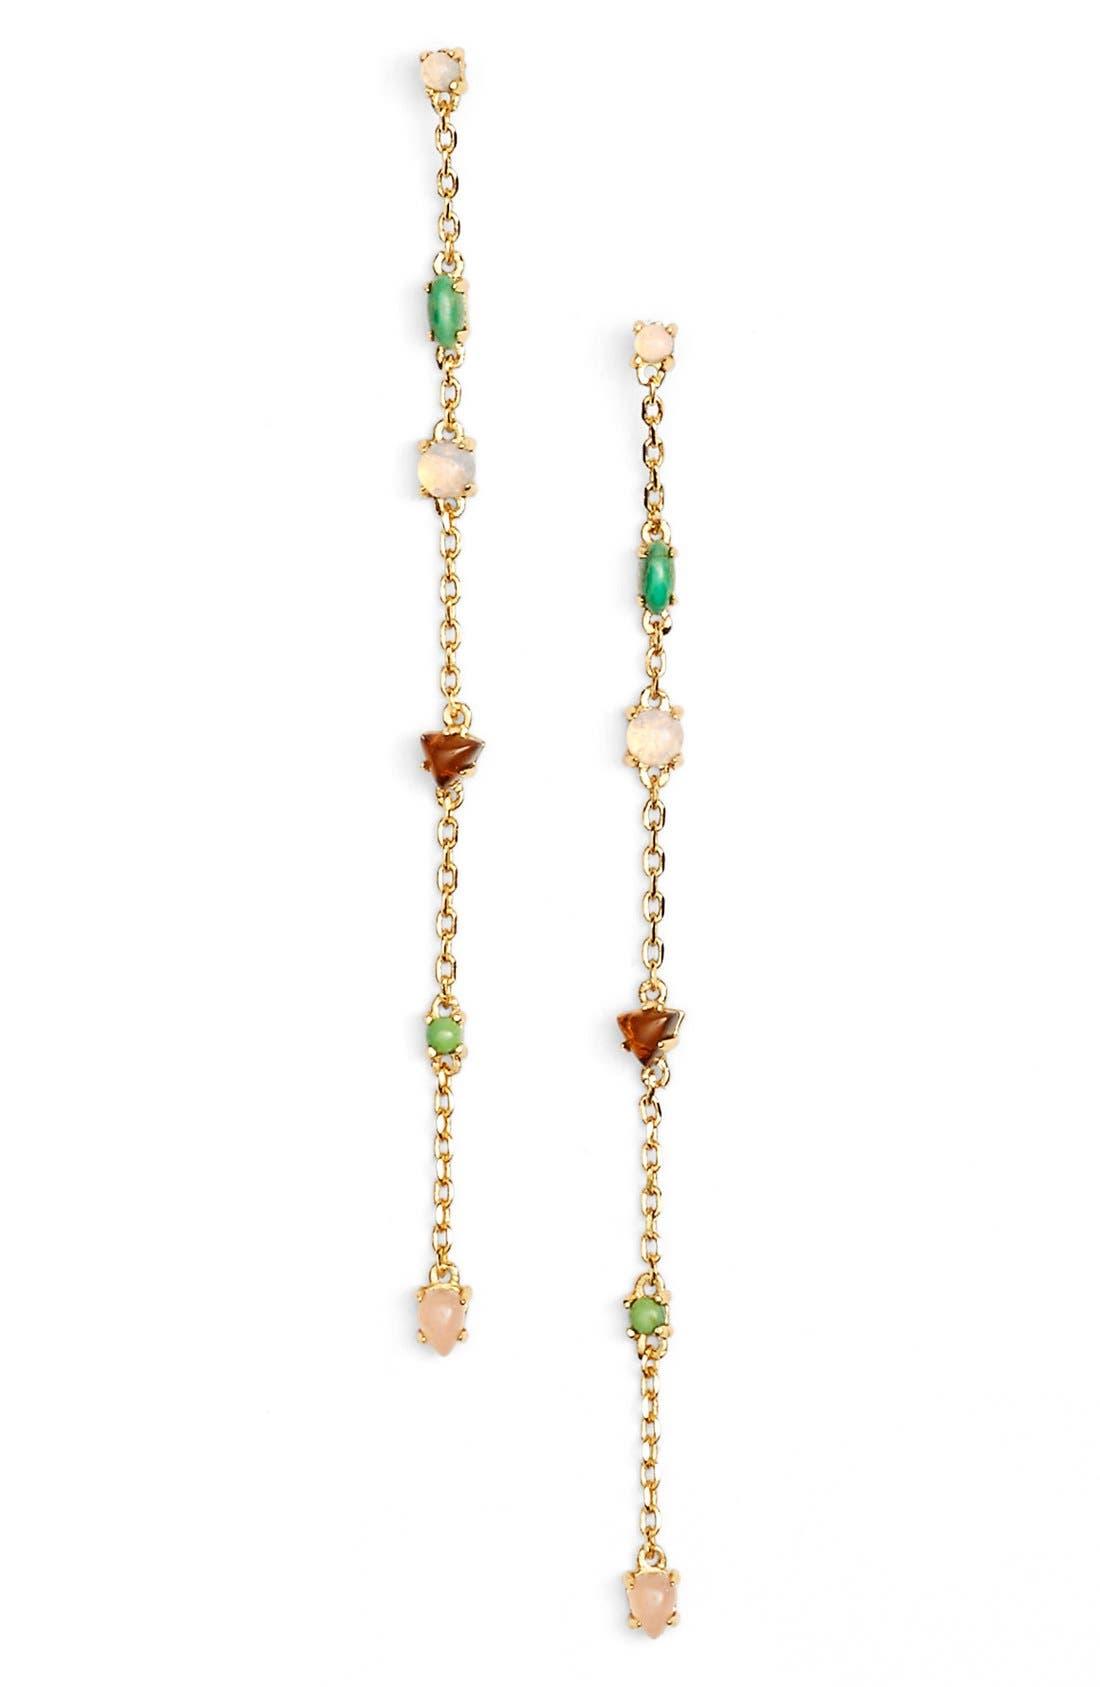 Alternate Image 1 Selected - Jules Smith 'Staz' Drop Earrings